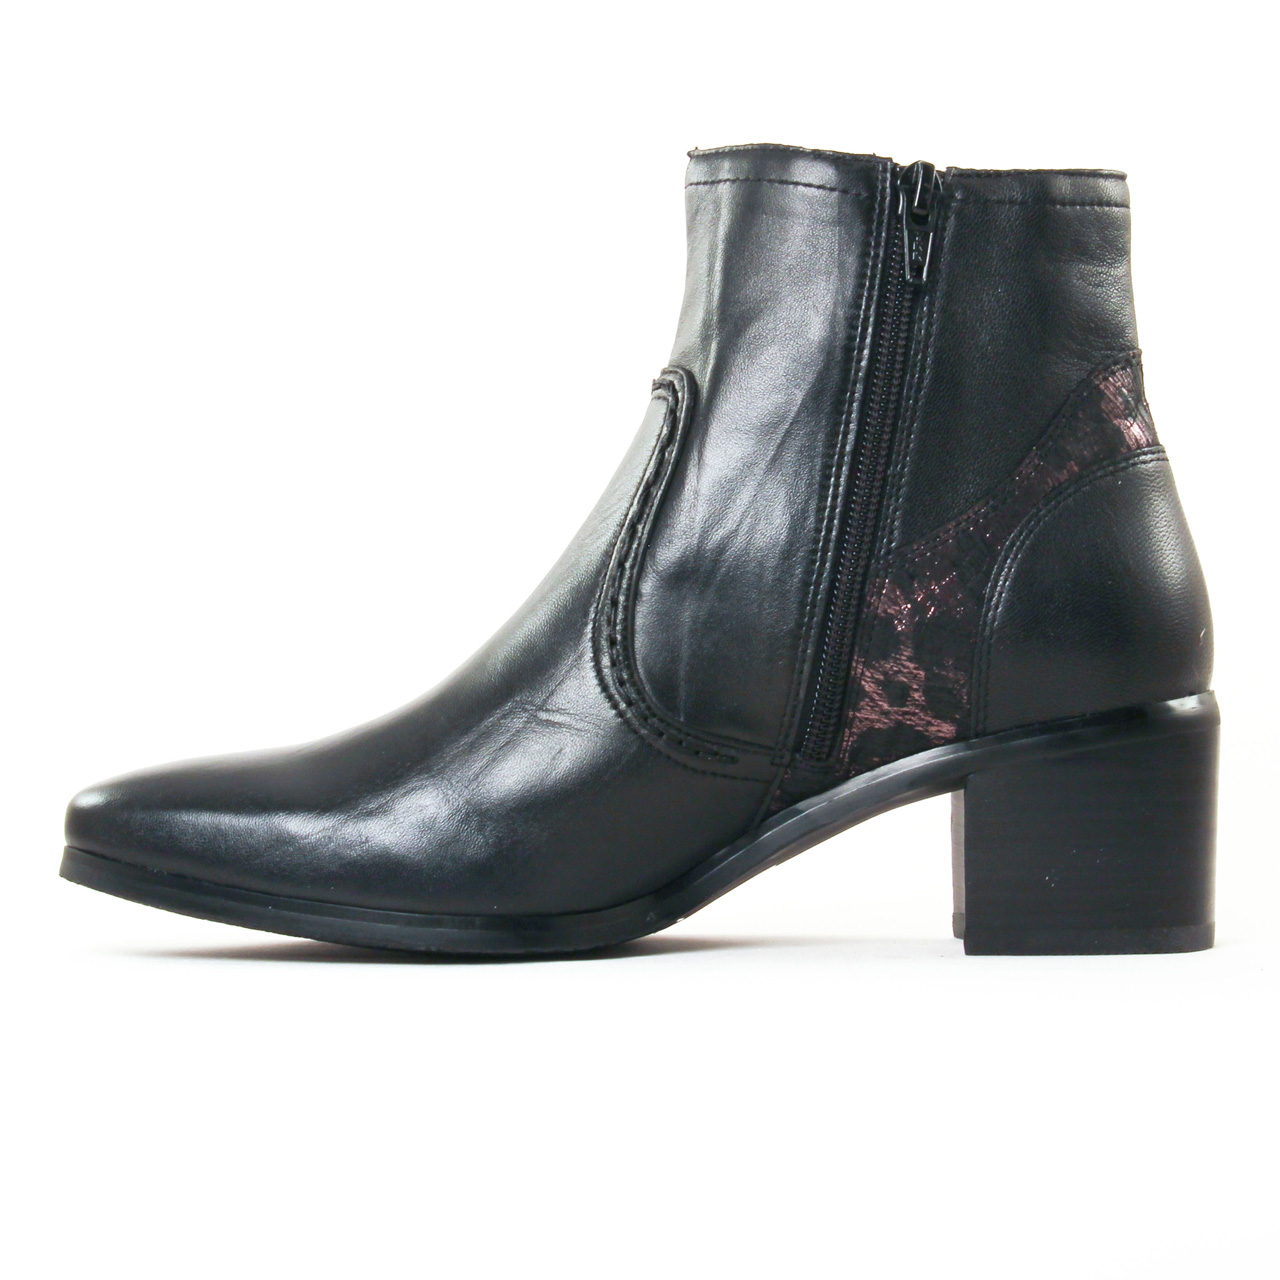 fugitive laino nappa noir boot talon noir automne hiver. Black Bedroom Furniture Sets. Home Design Ideas